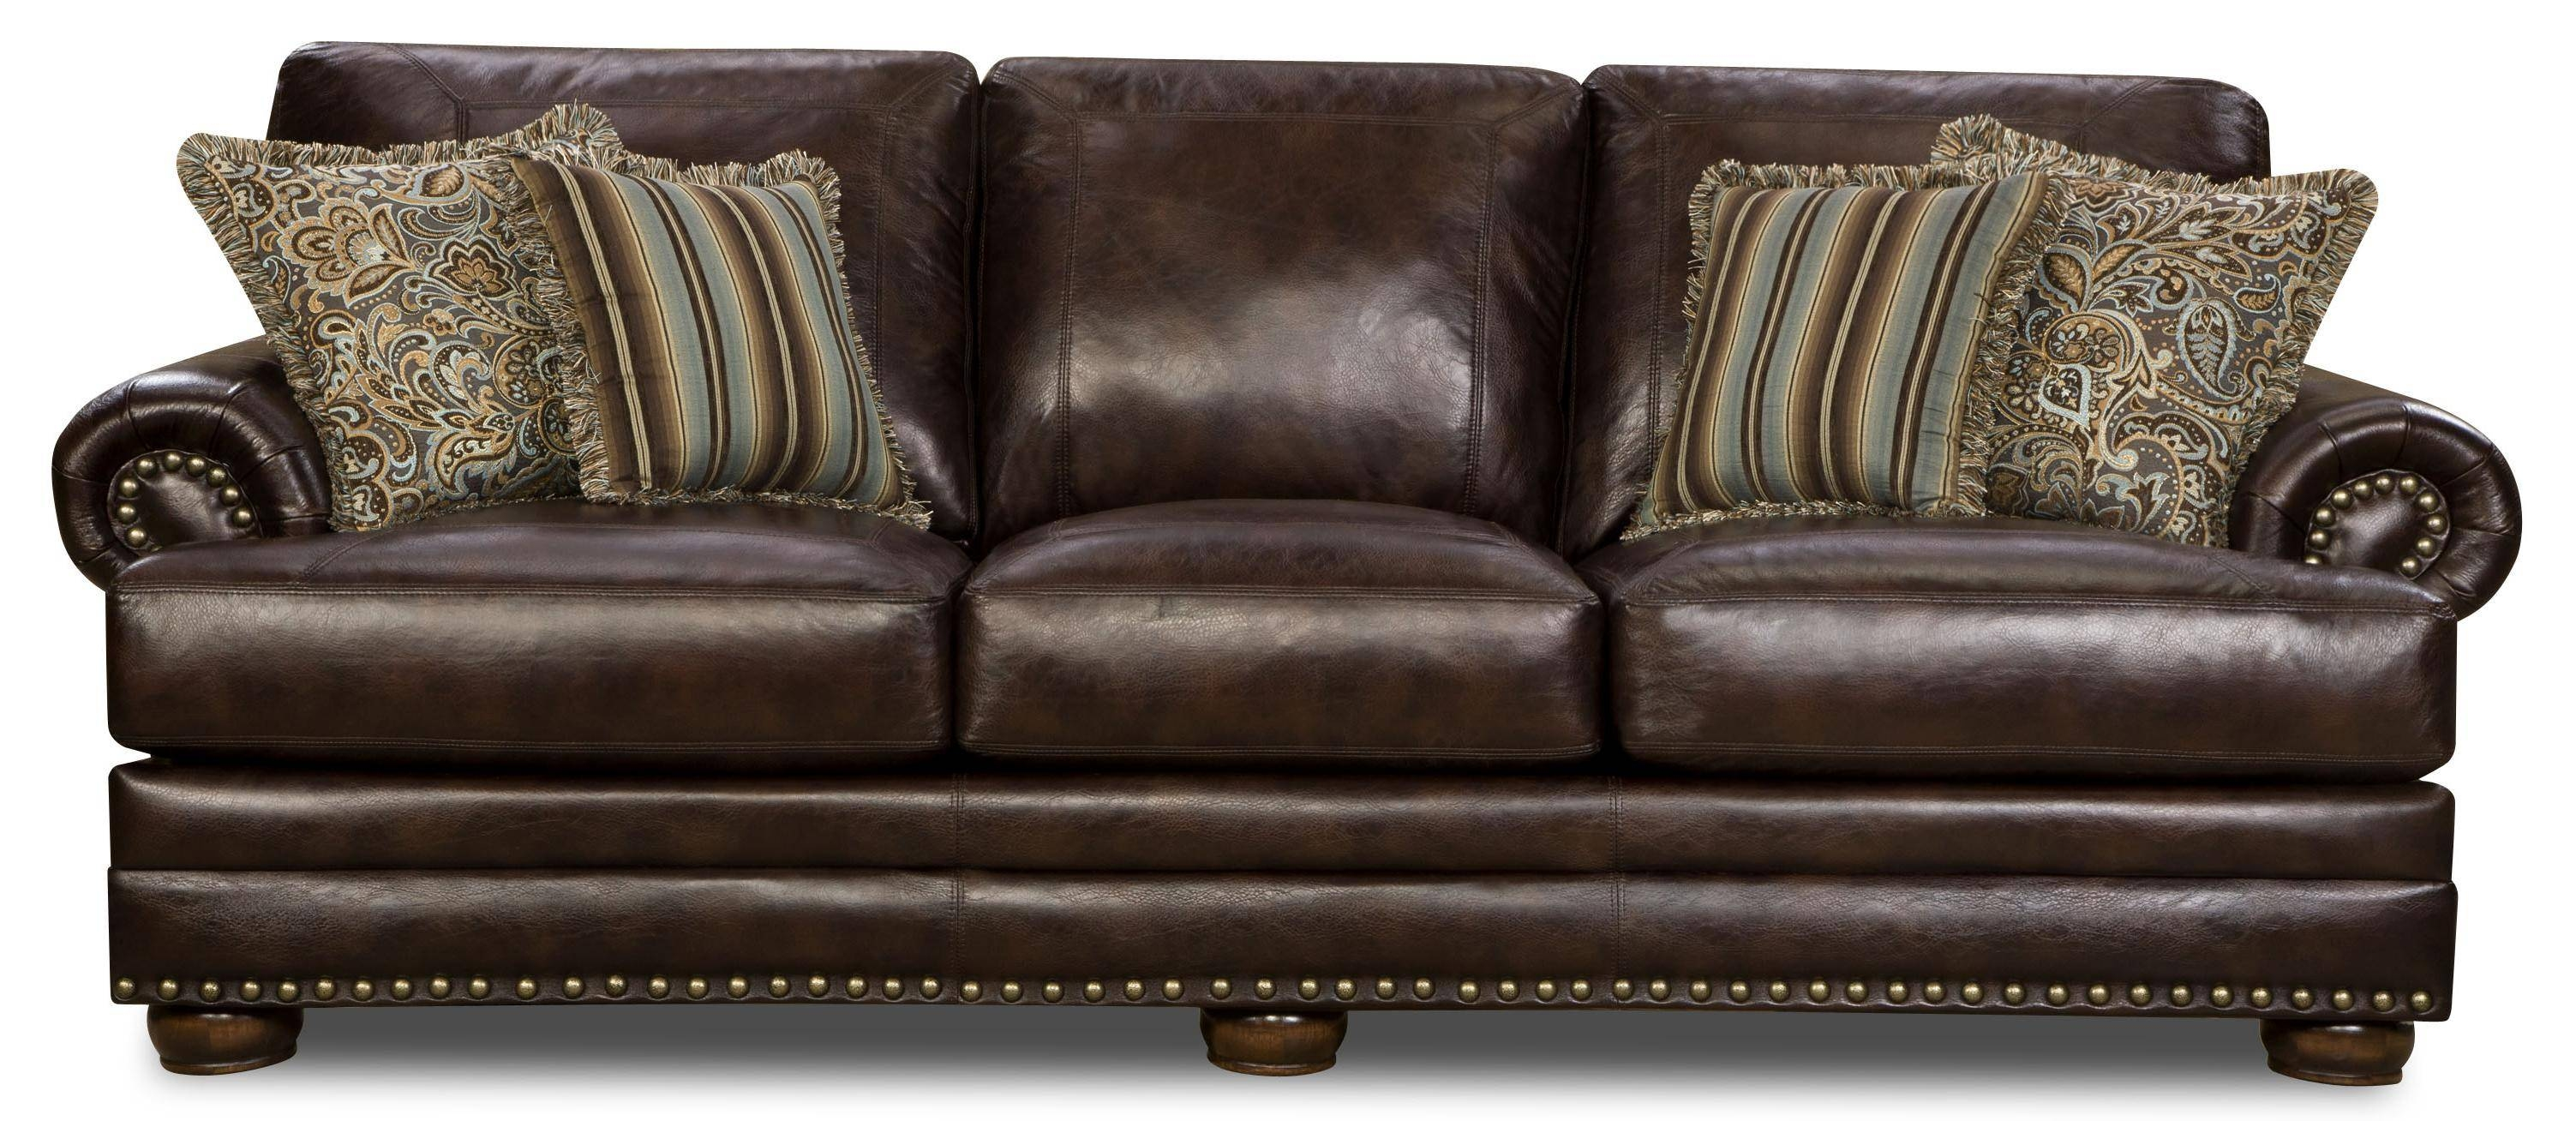 Corinthian Leather Sofa Corinthian Alexander Leather Reclining within Corinthian Sofas (Image 10 of 15)